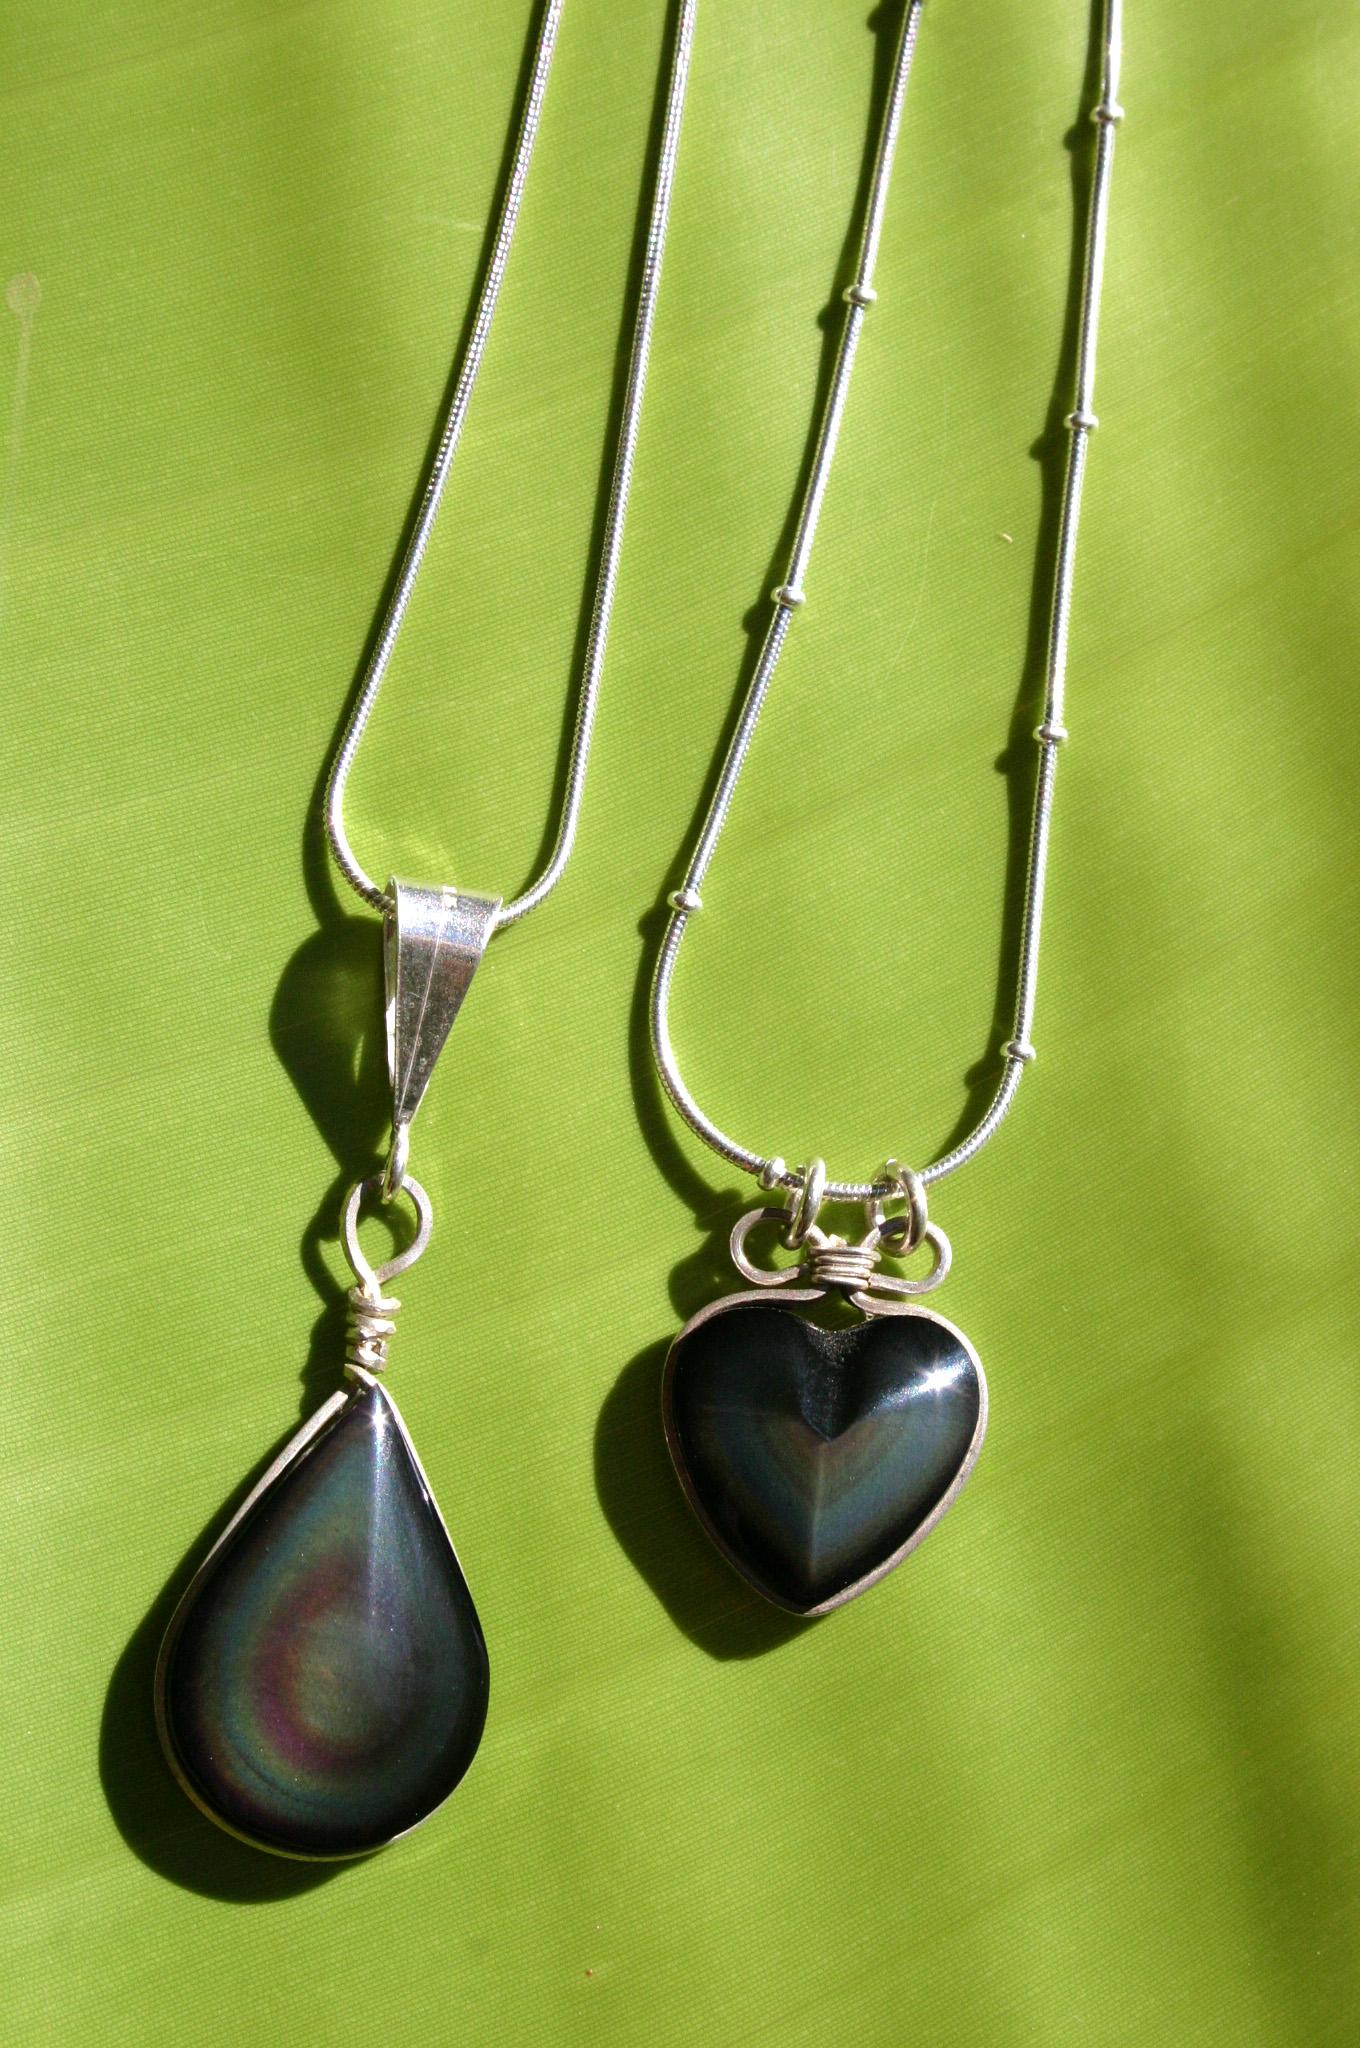 Rainbow Obsidian circa 2004